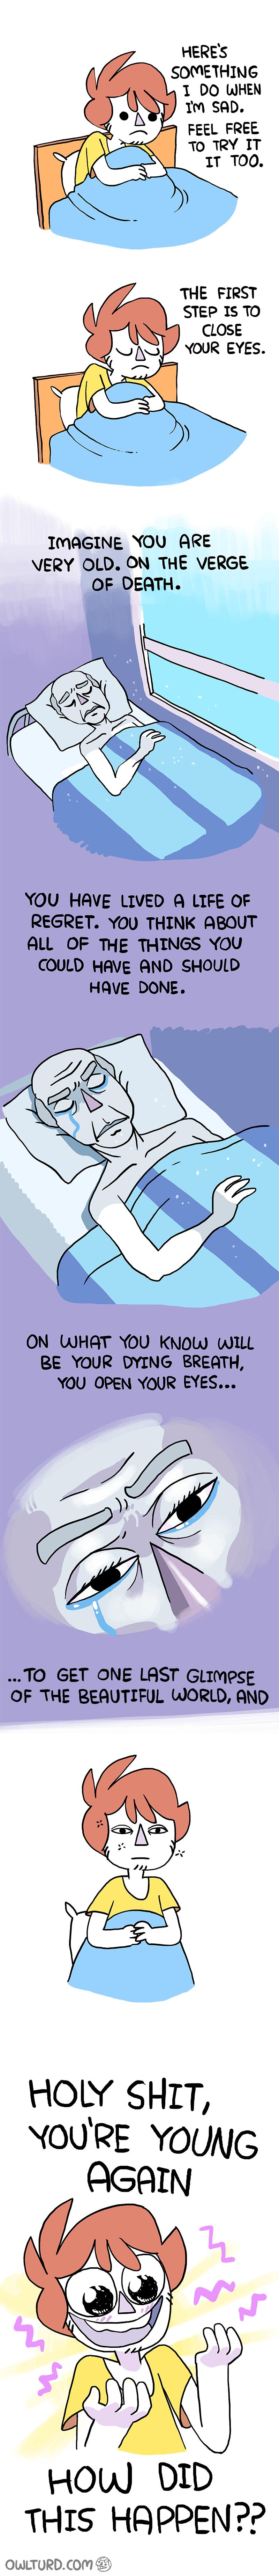 life-advice-web-comics-visualize-regret